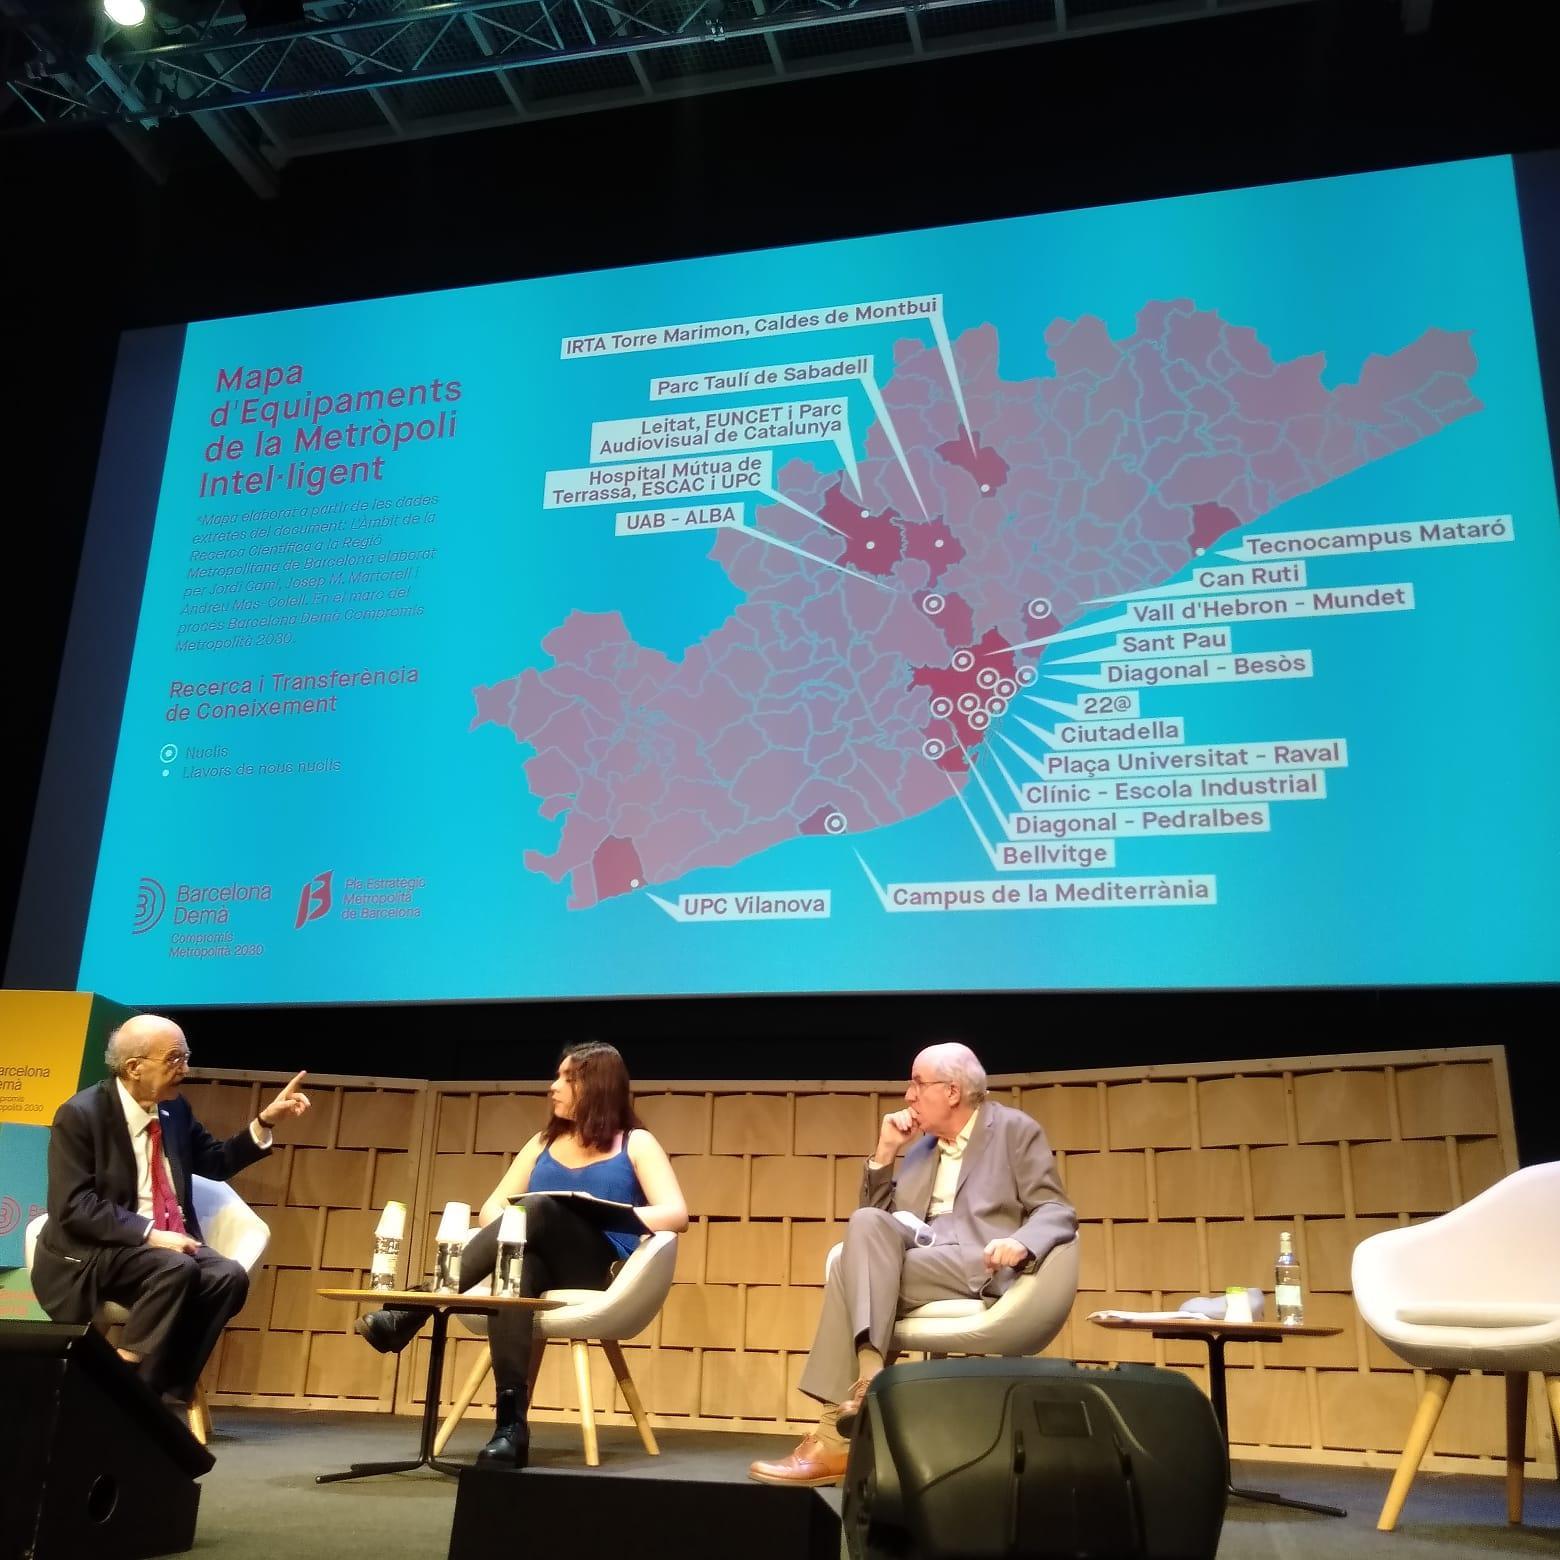 Jordi Camí, Andreu Mas-Colell i Valentina Raffio durant la presentació del mapa de equipamientos de la Metropoli Inteligente